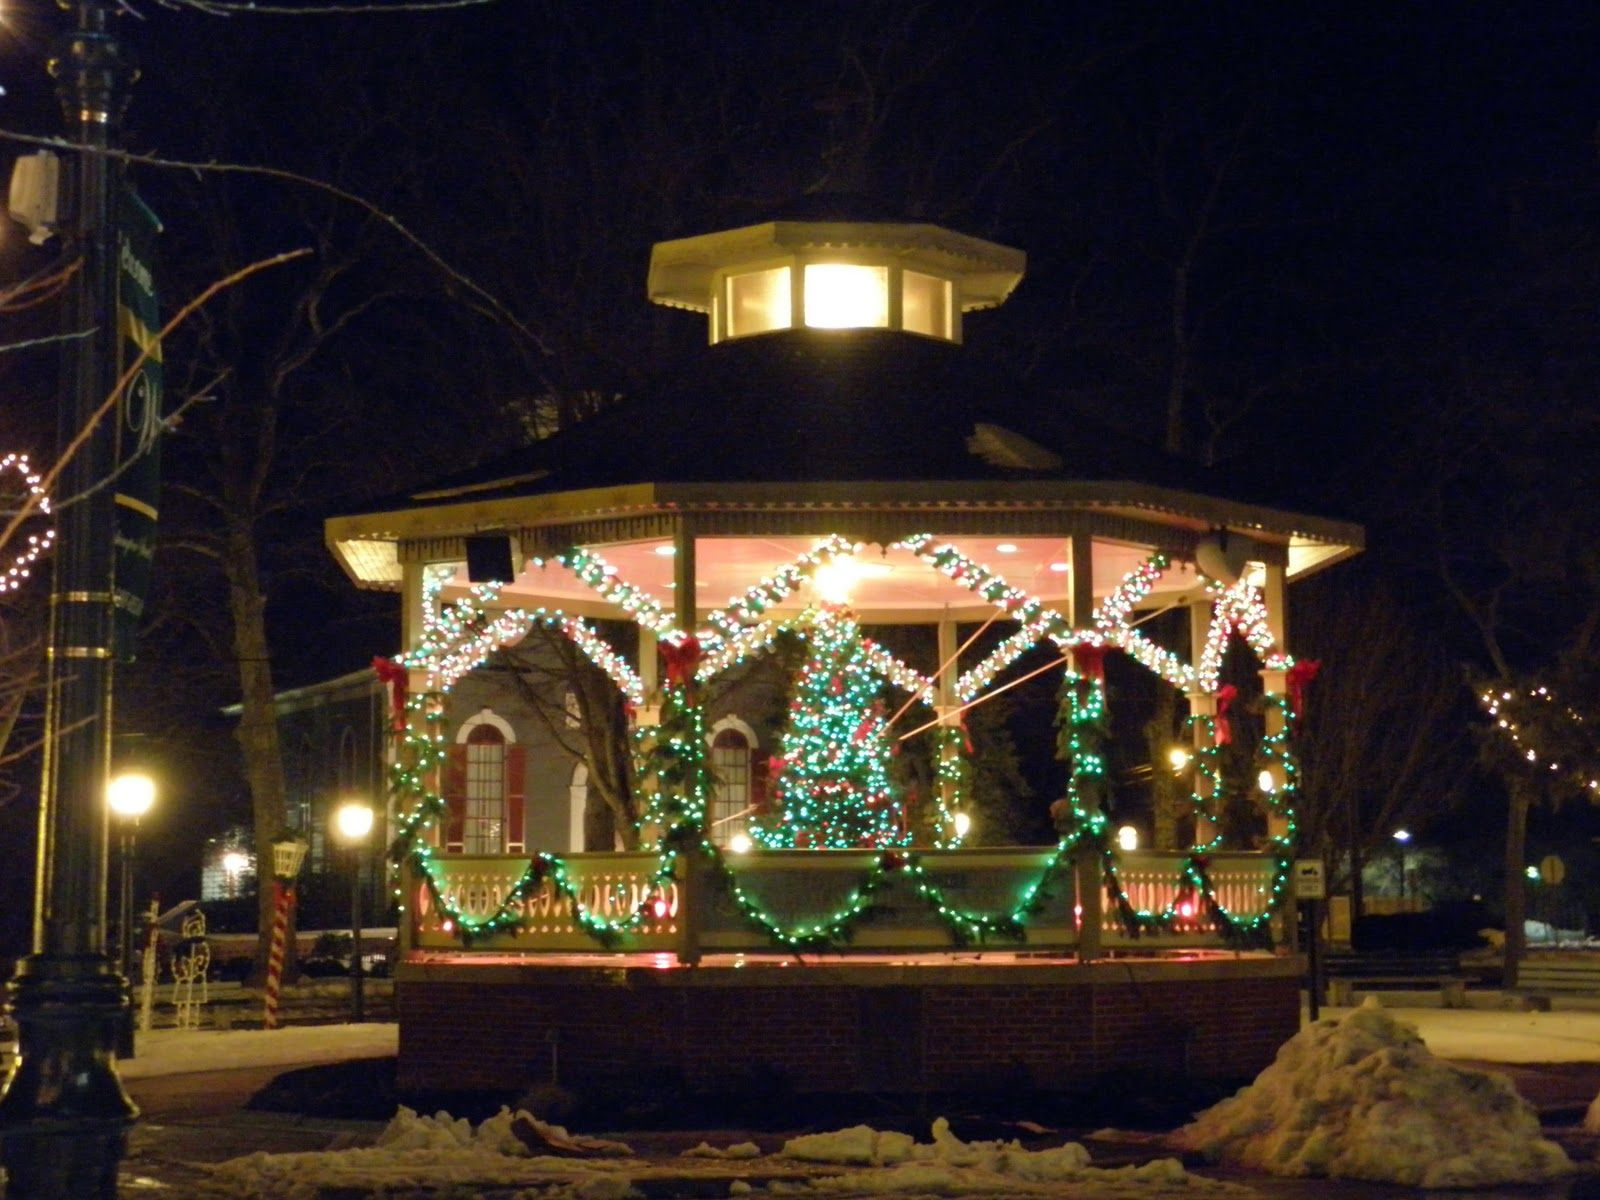 Picture Of Beautiful Outdoor Gazebo Lighting Outdoor Christmas Tree Outdoor Christmas Decorations Decorating With Christmas Lights